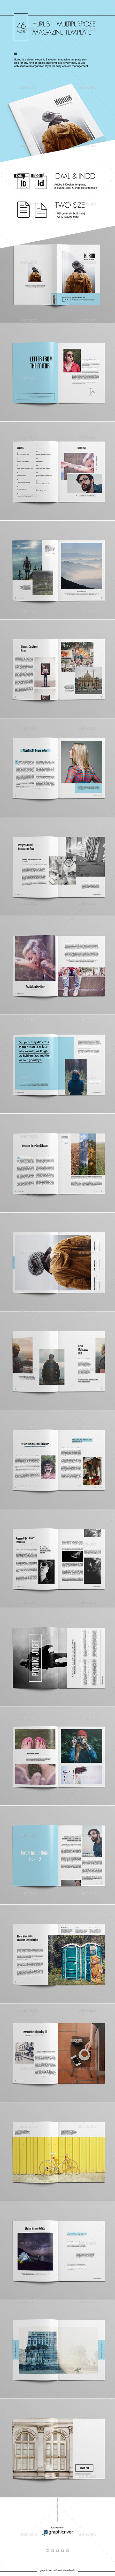 Hurub Multipurpose Magazine Template - Magazines Print Templates